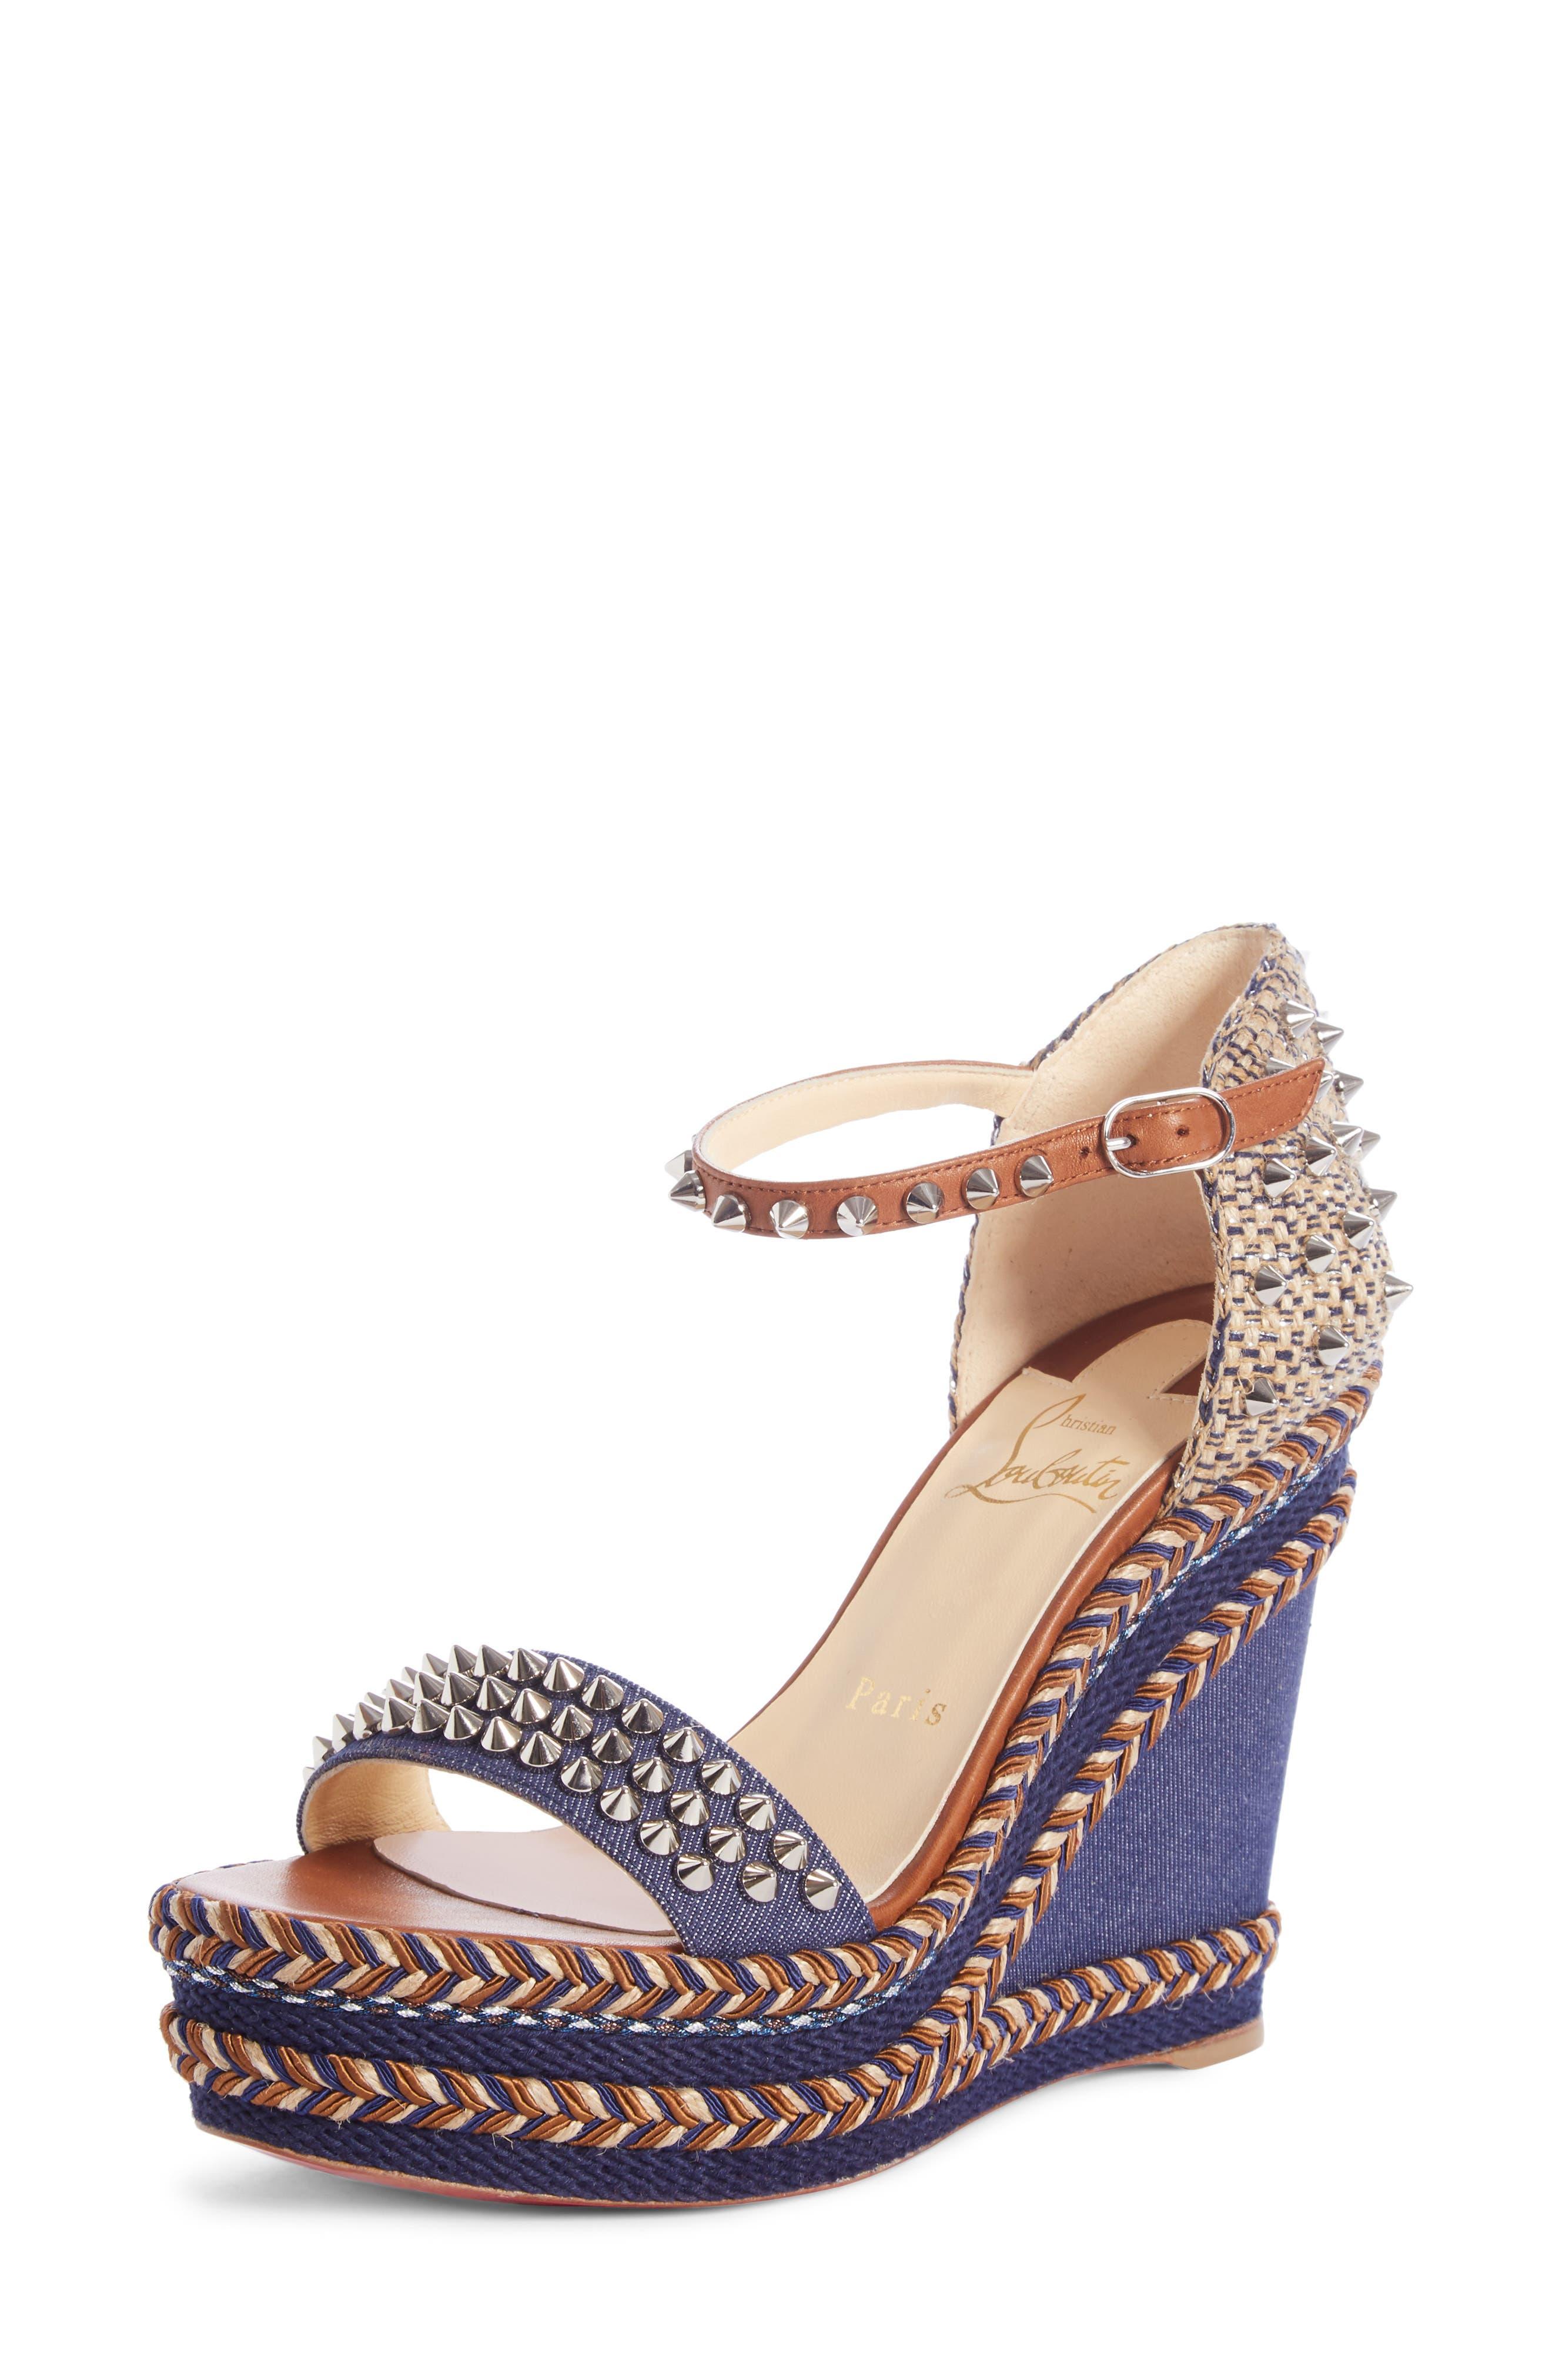 Mad Monica 120 Leather & Denim Platform Wedge Sandals in Blue/ Brown